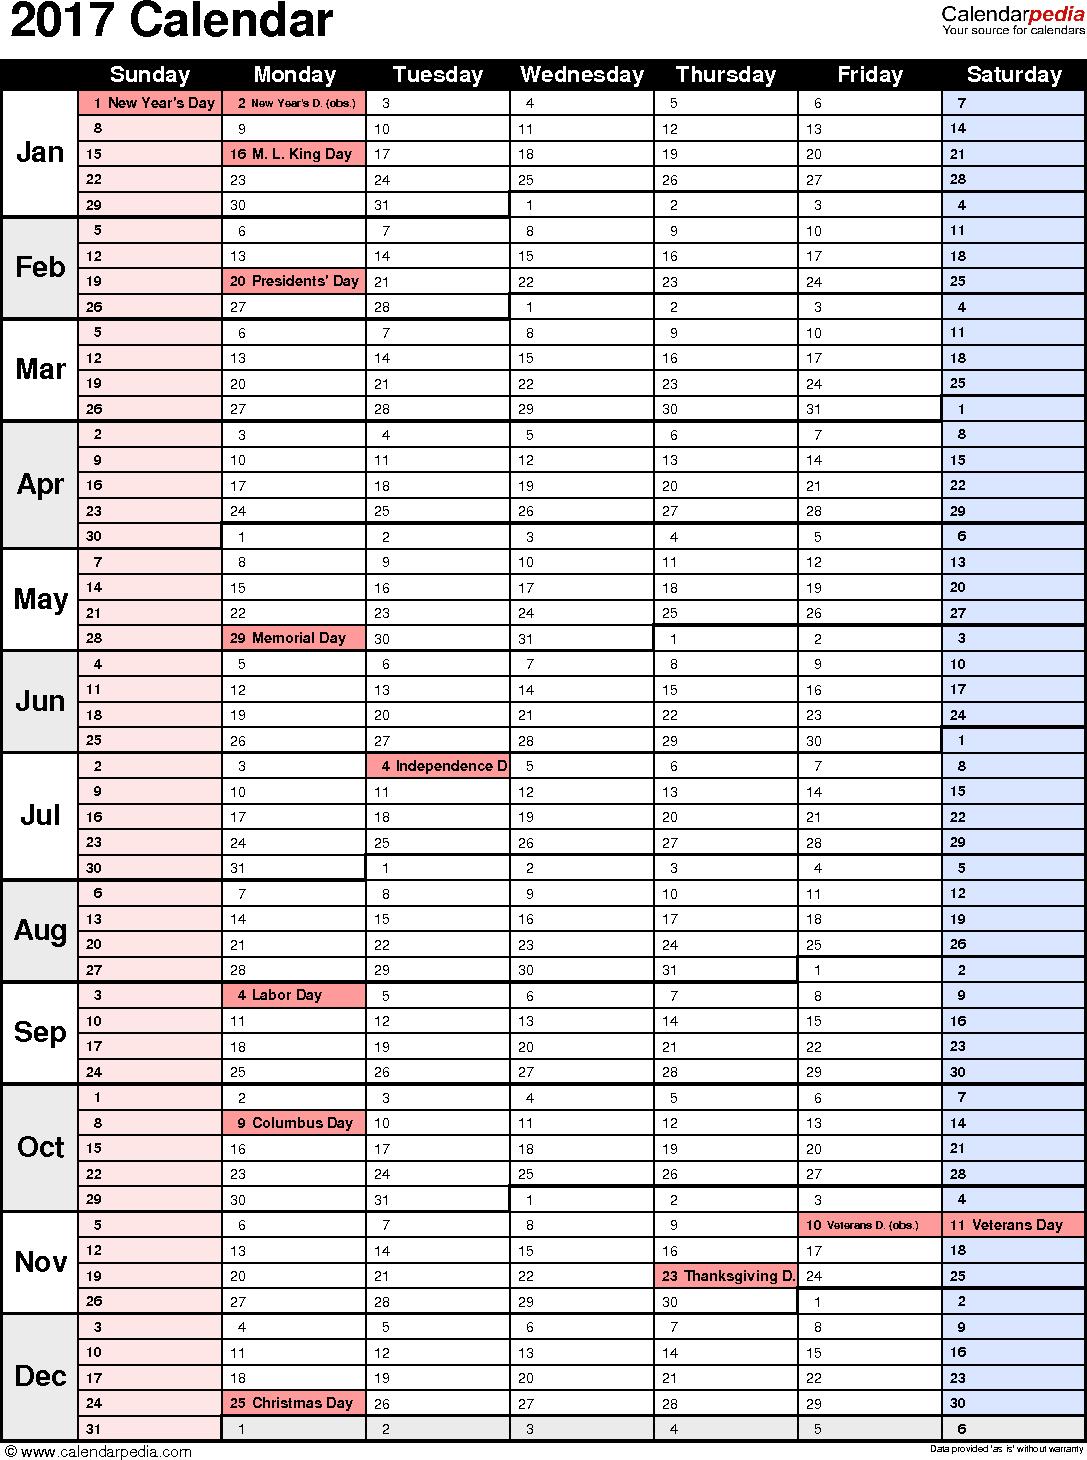 Free Excel Calendar 2017 Template In Excel Calendar 2017 Template Examples